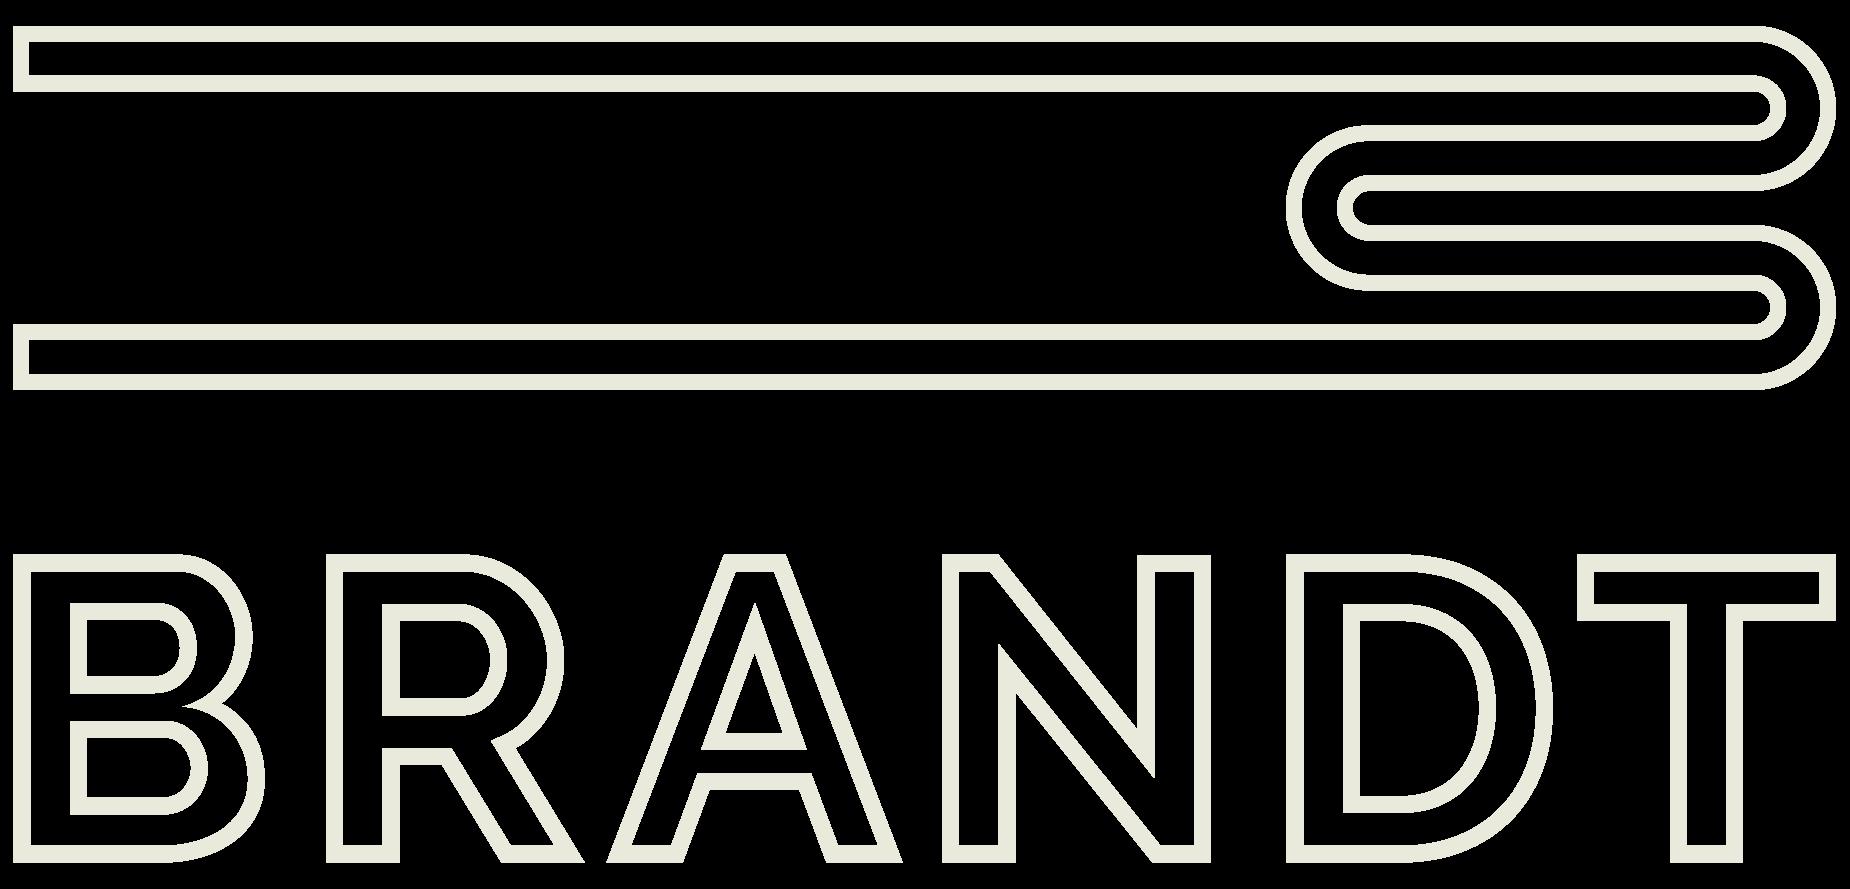 BRANDT_FULL_BEIGE-13.png